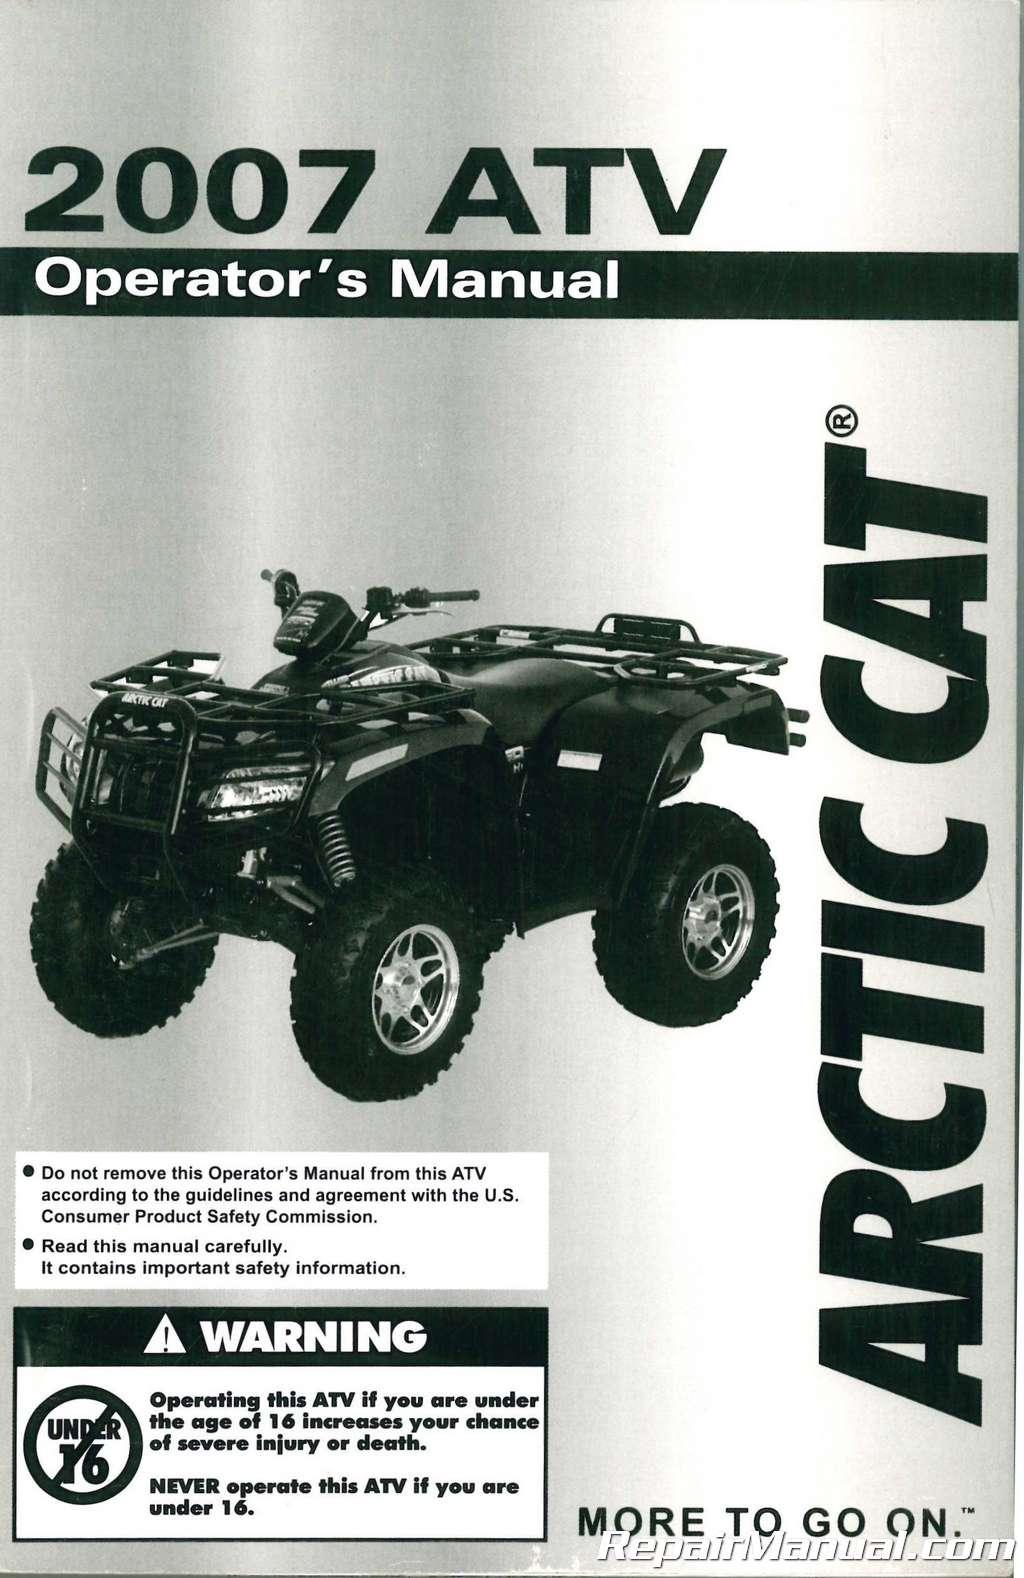 2003 arctic cat 500 atv owners manual